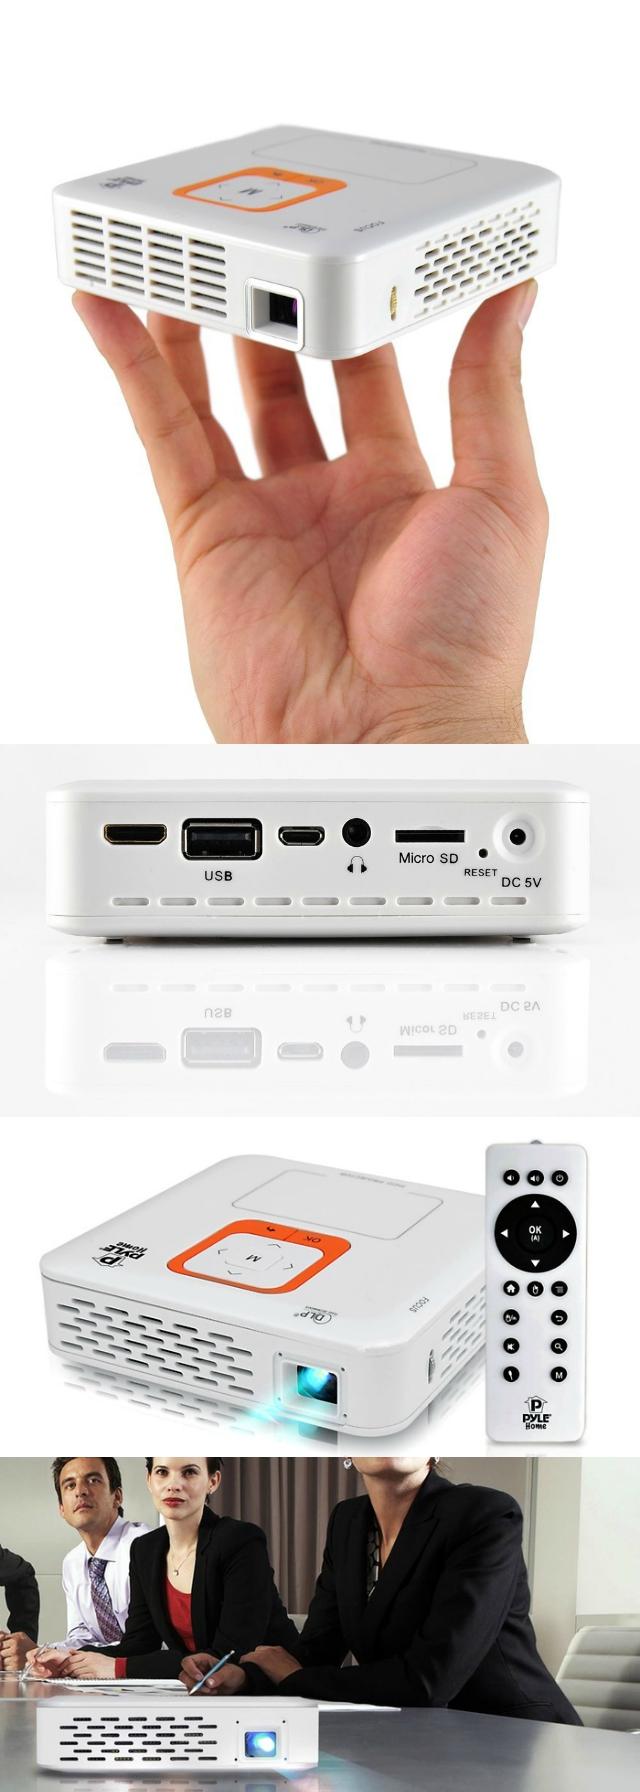 Pyle Smart Pocket Projector